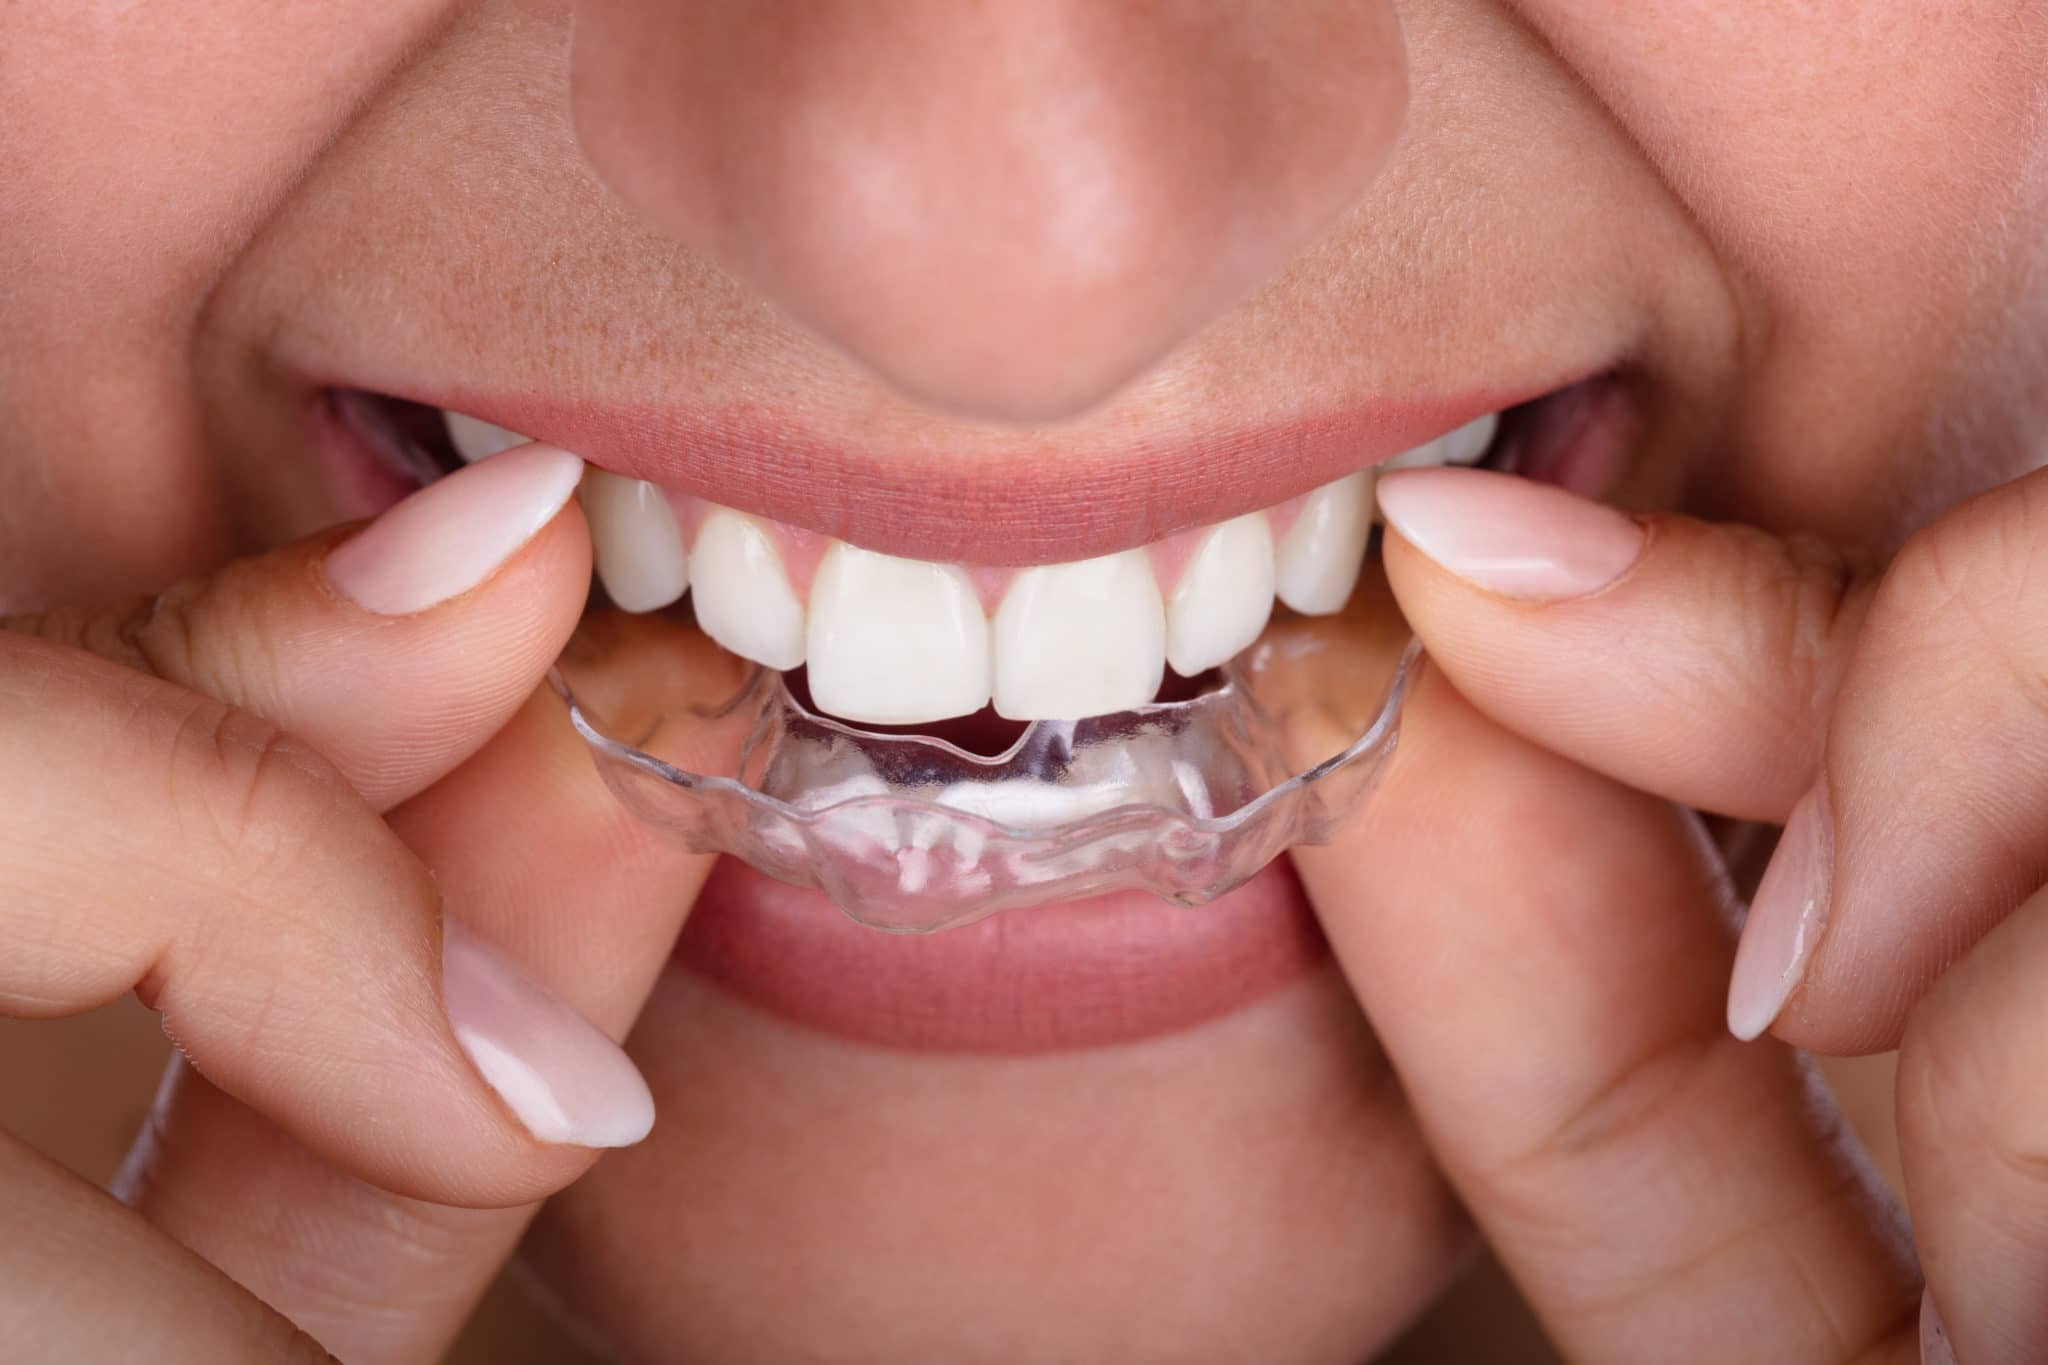 veneers can straighten teeth without braces